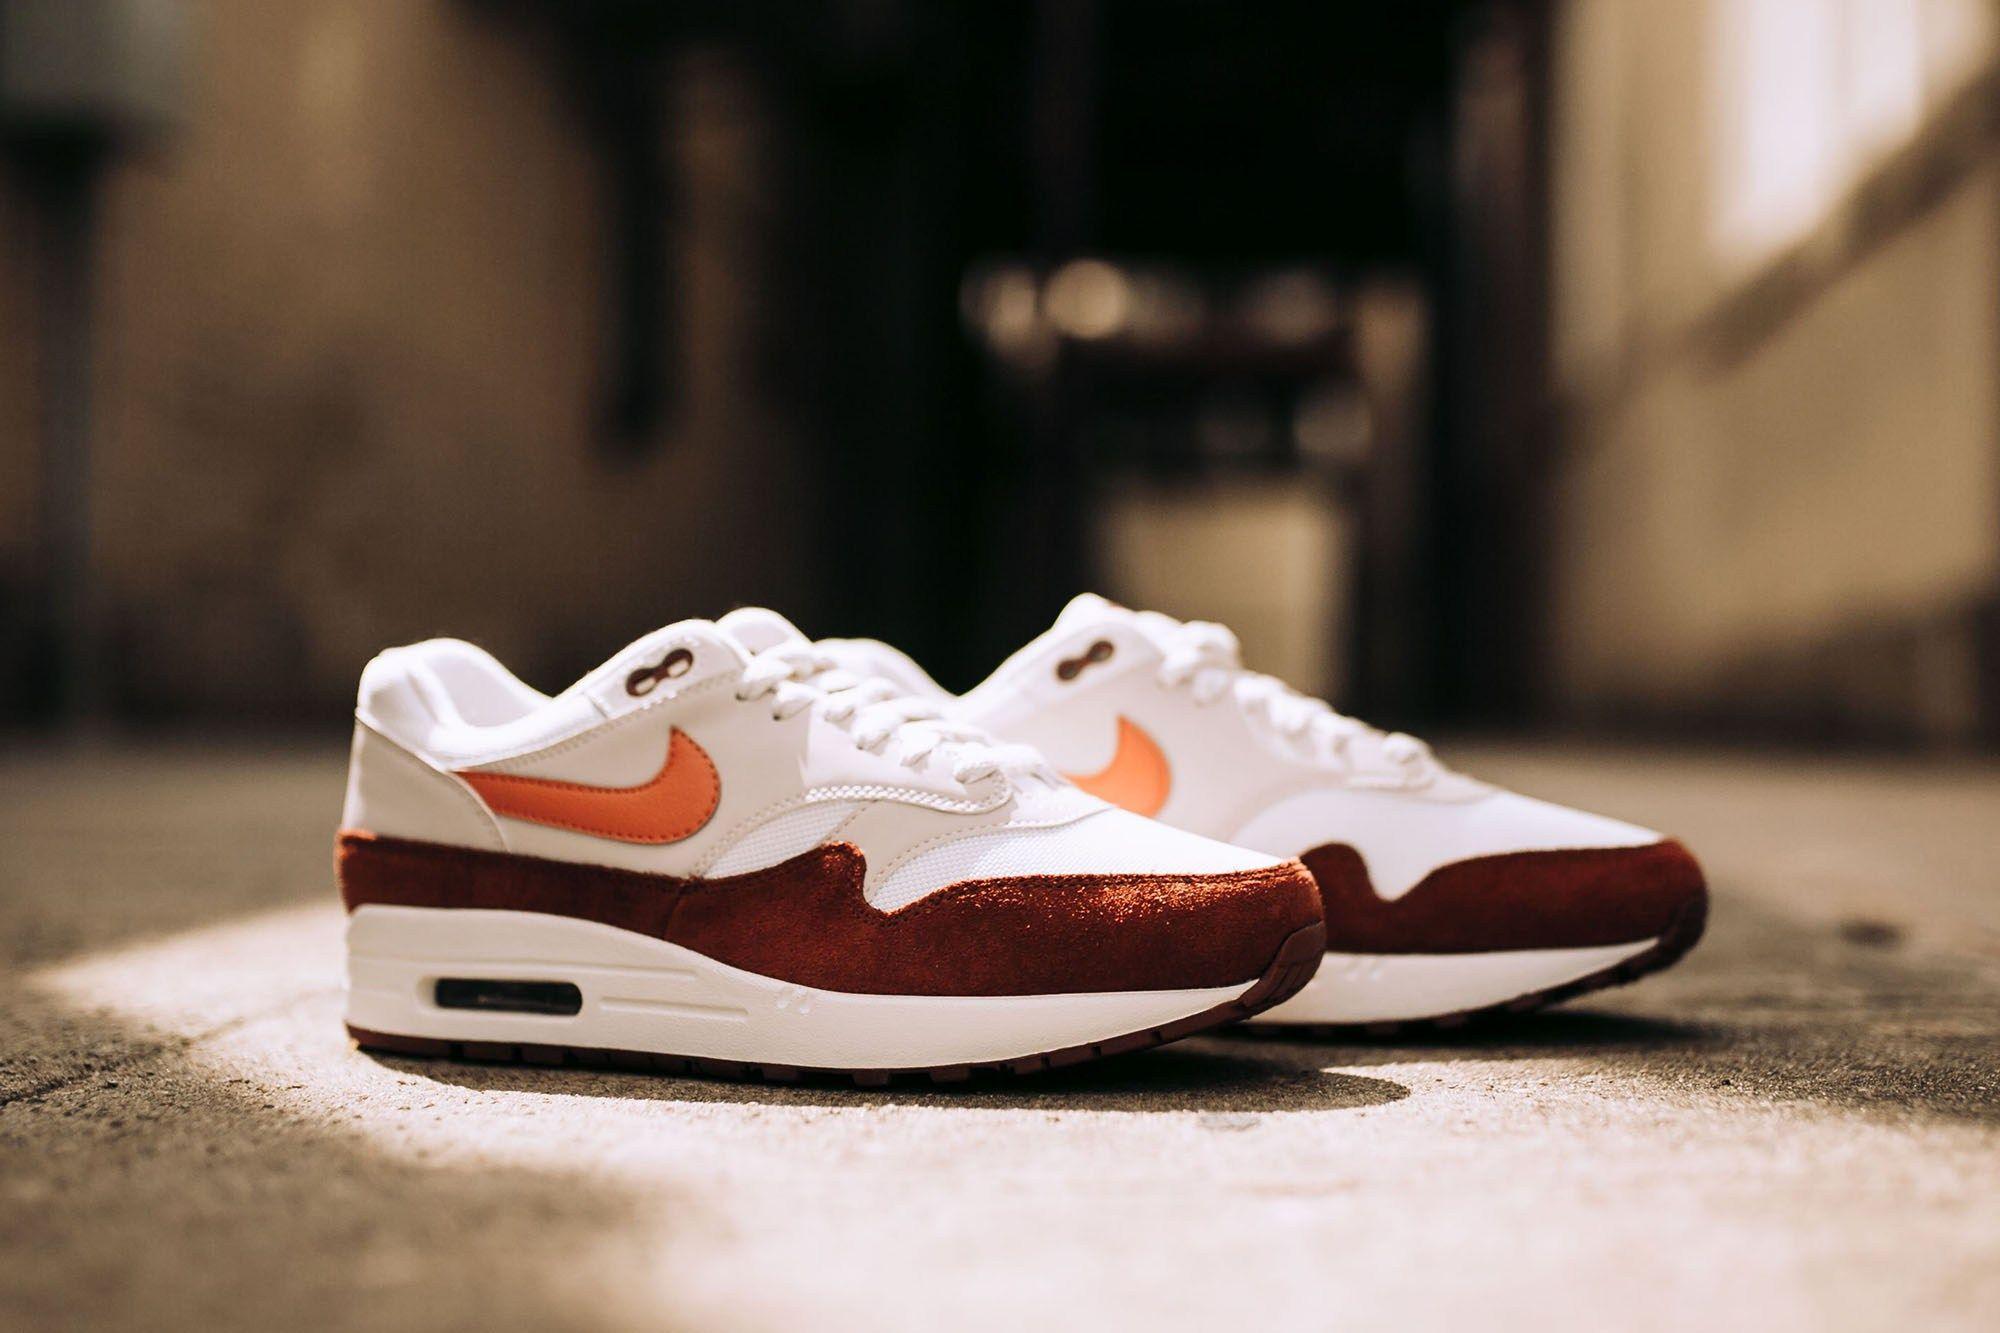 separation shoes 62c43 a763a Nike Air Max 1 in Vintage Coral Mars Stone - EU Kicks  Sneaker Magazine